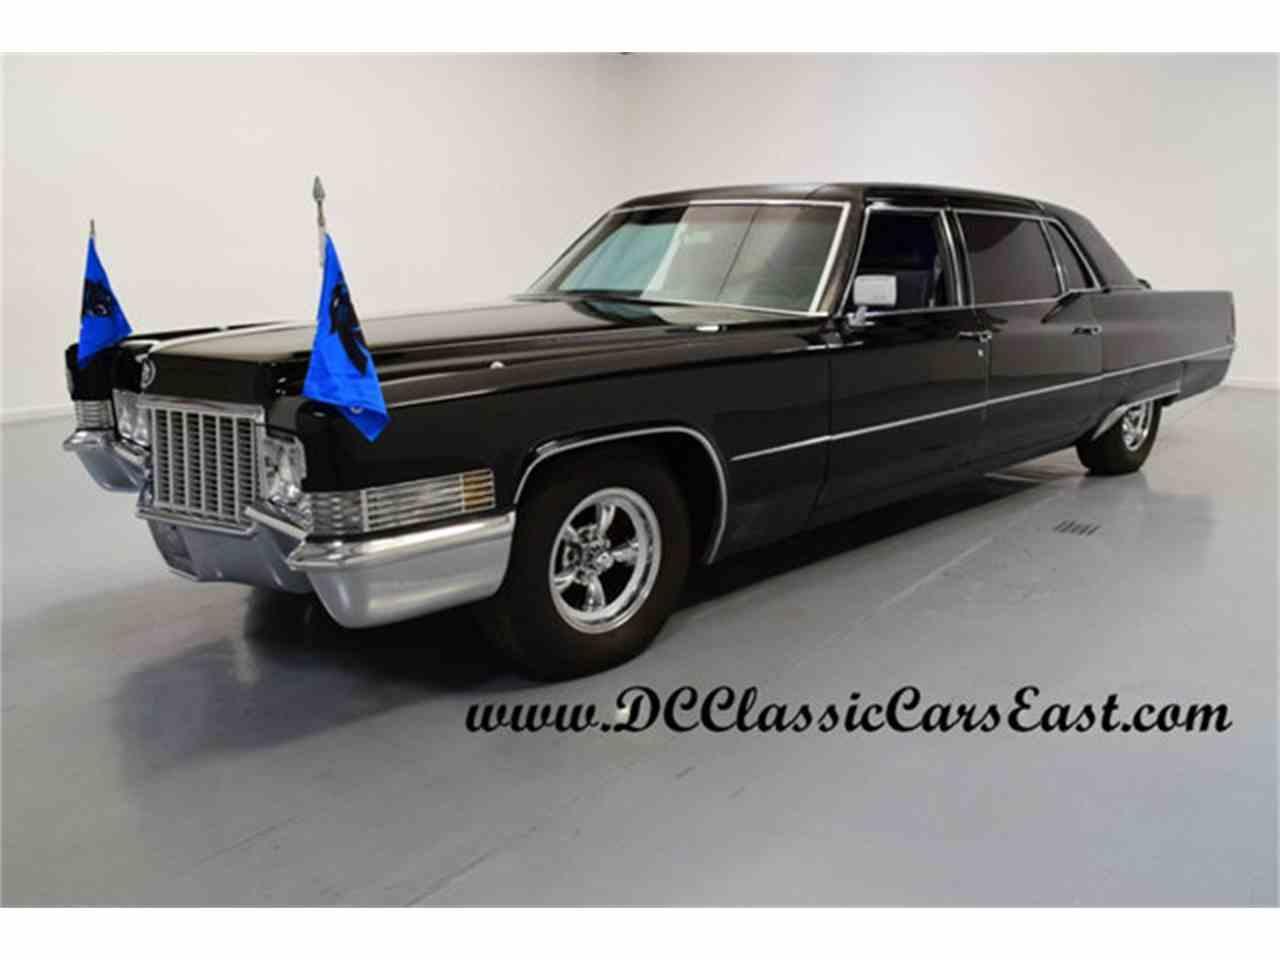 1970 Cadillac Fleetwood for Sale - CC-986993